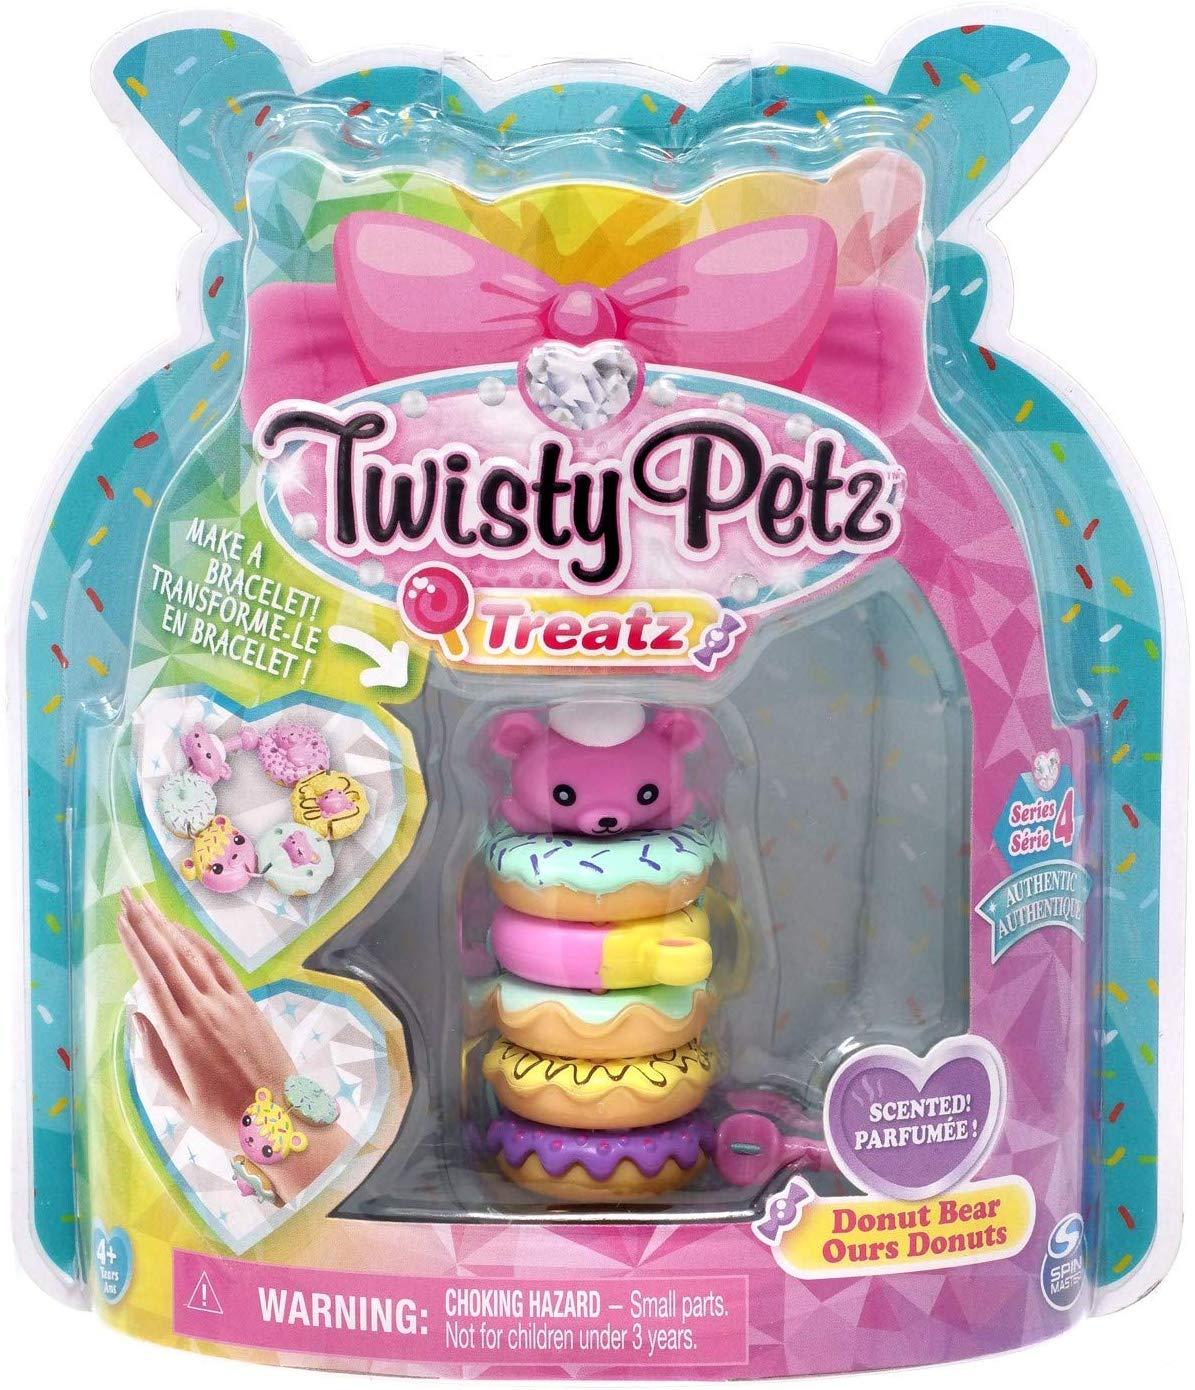 Twisty Petz Treatz Bracelets series 4